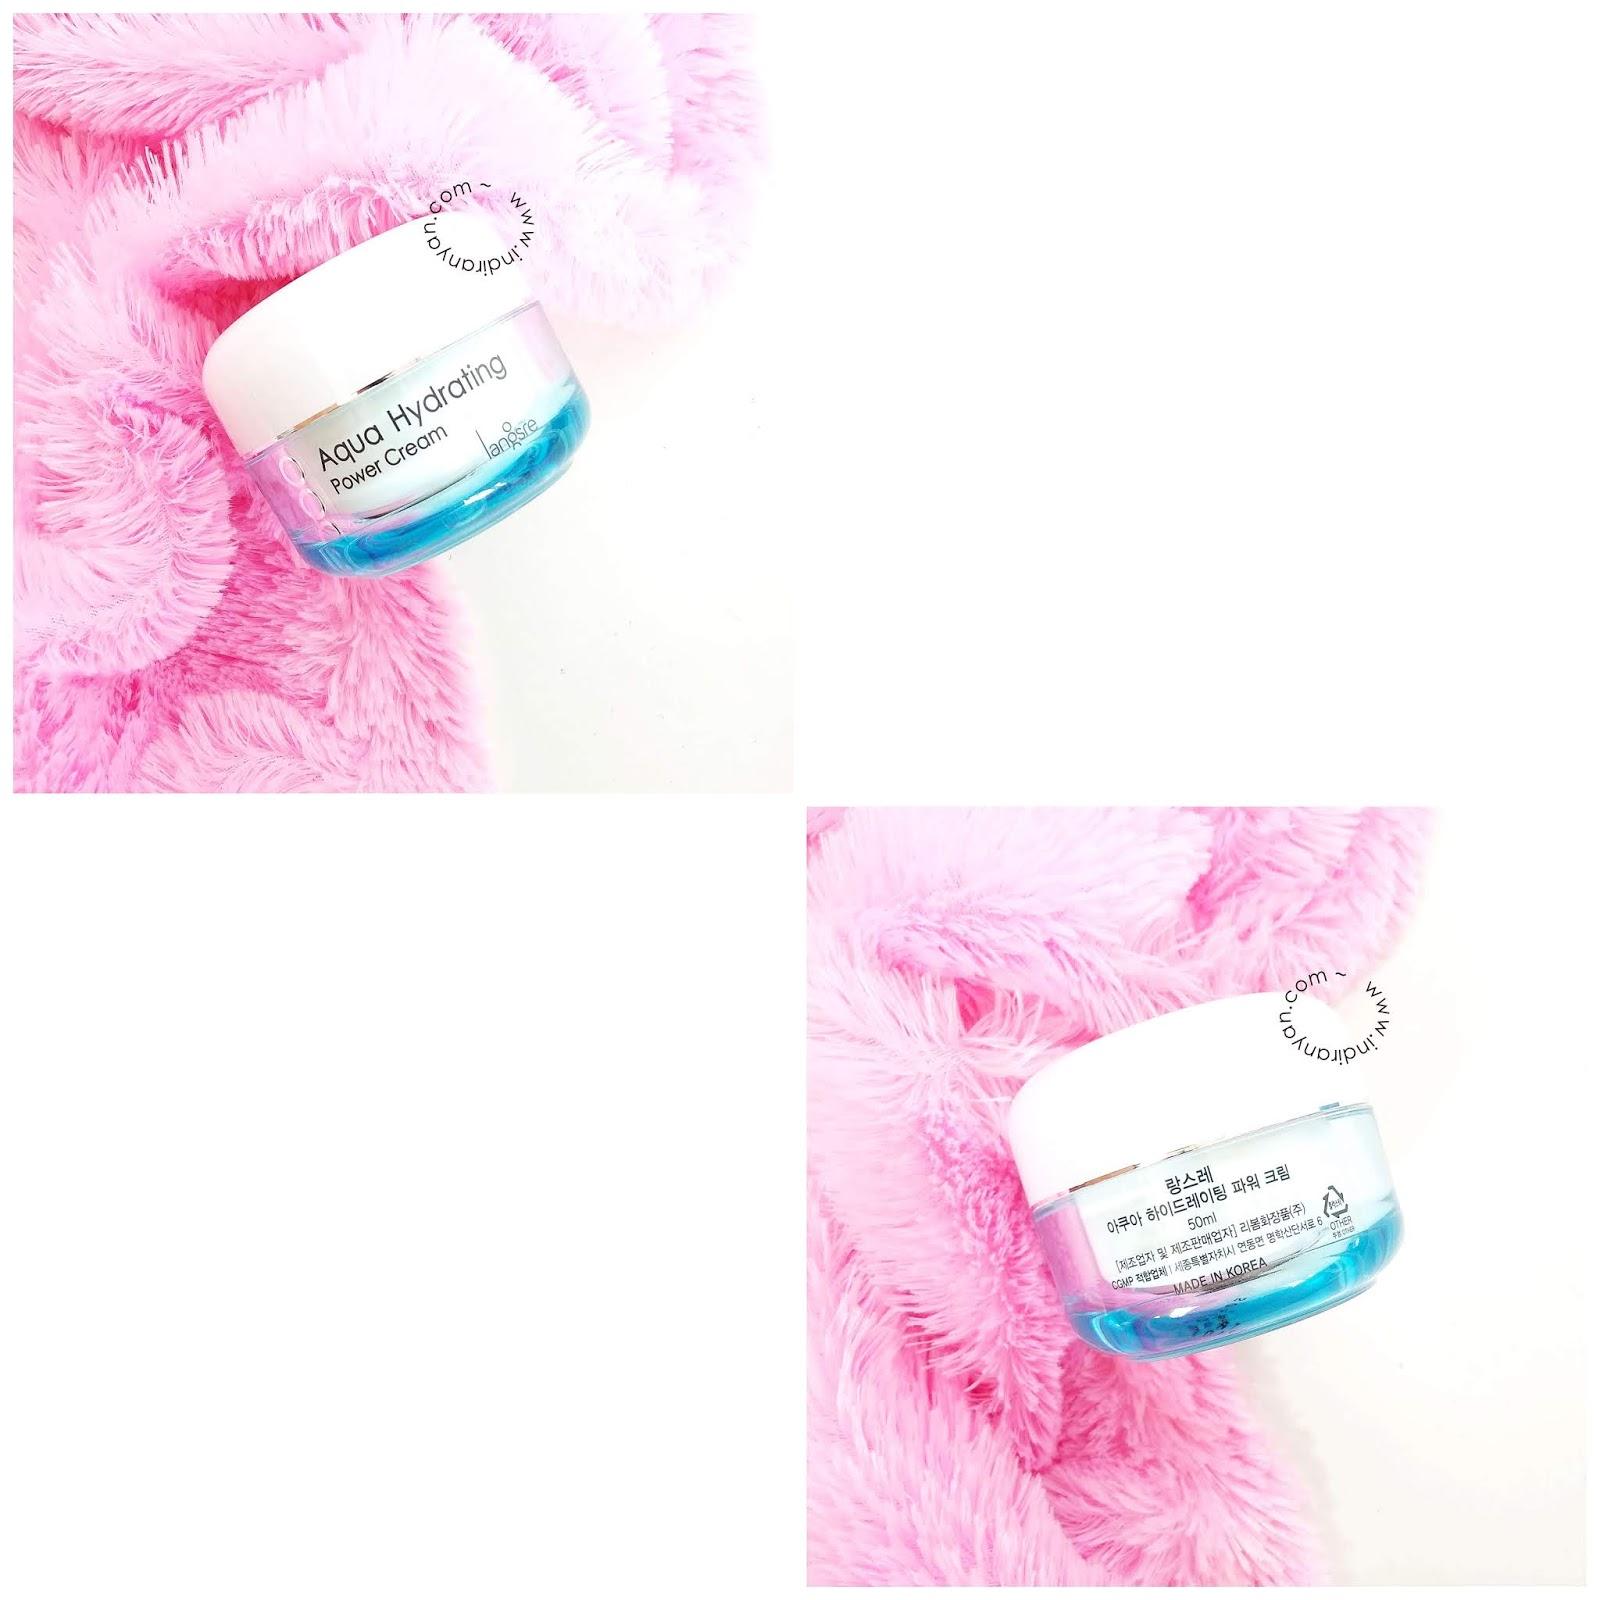 langsre-aqua-hydrating-power-cream